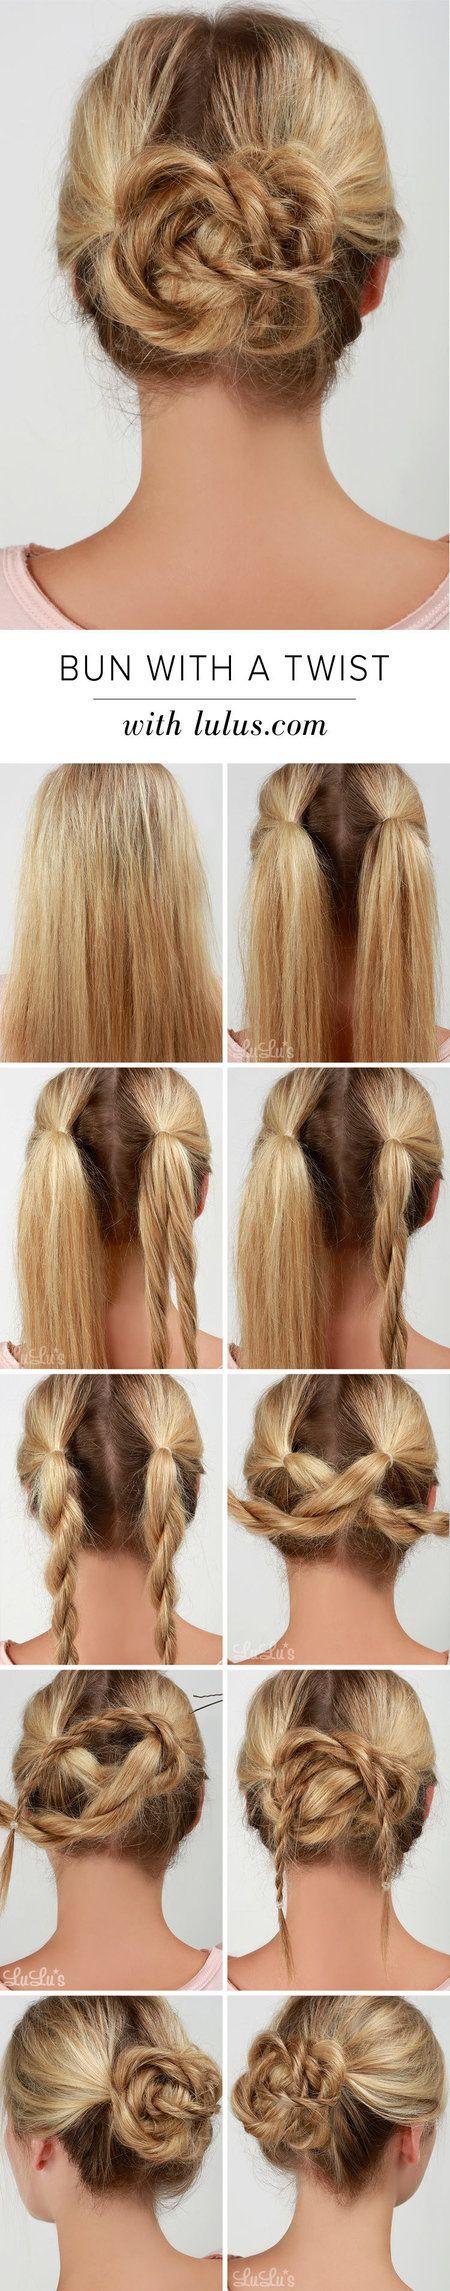 Twisty bun tutorial hairtutoiral blonde updo hair inspiration twisty bun tutorial hairtutoiral blonde updo baditri Choice Image